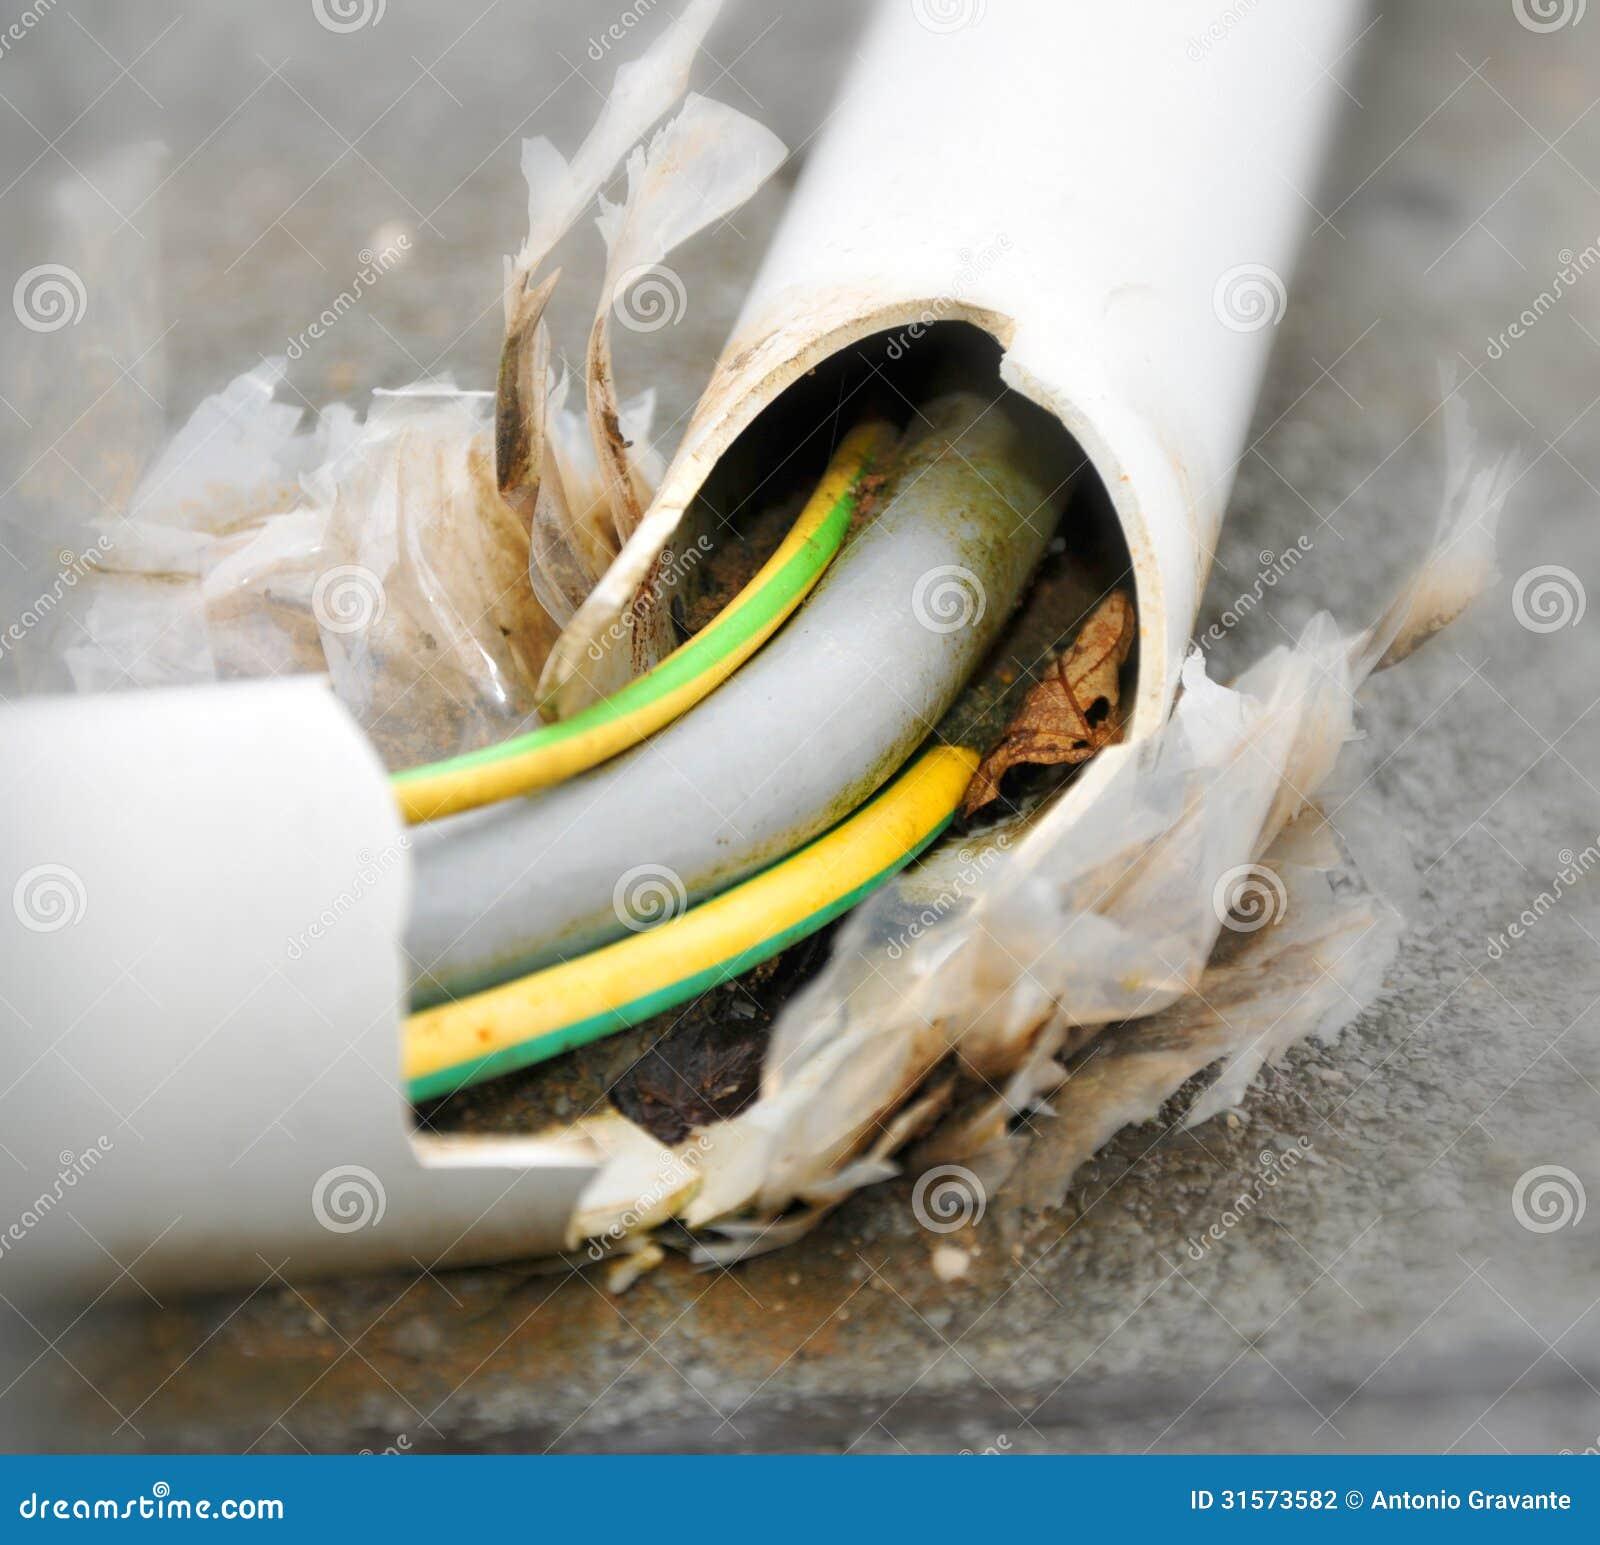 Damaged Electrical Cords : Damaged power cord stock photo image of macro metal